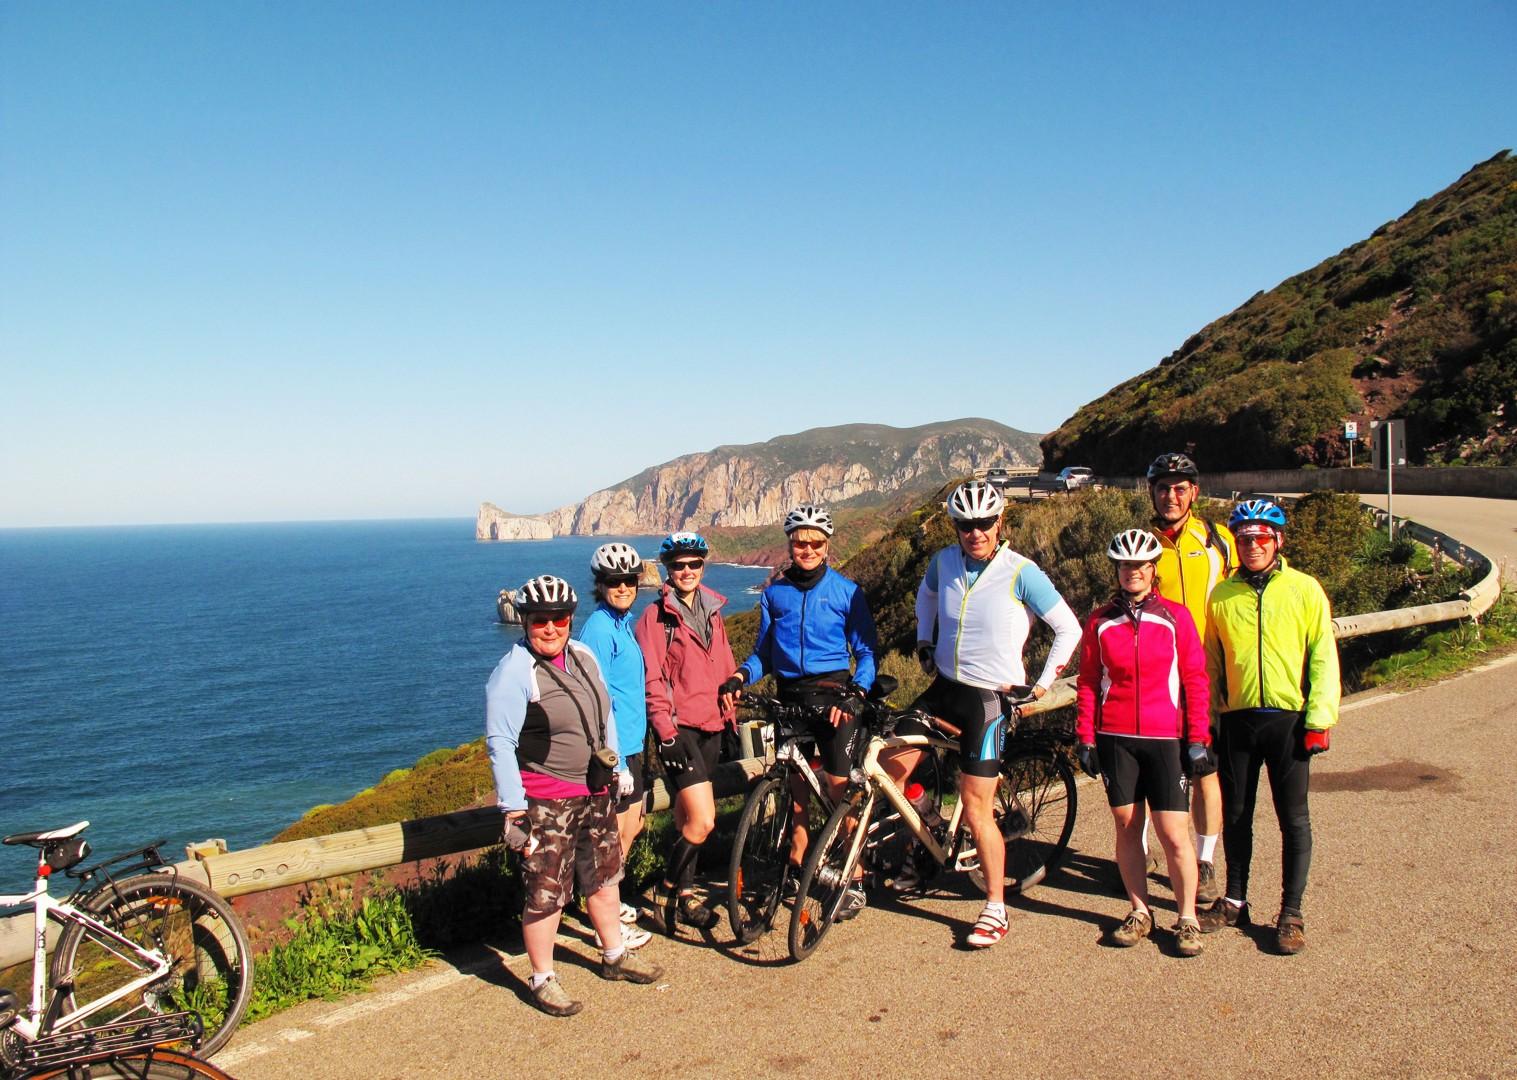 group-guided-cycling-holiday-italy-sardinia.jpg - Sardinia - Island Flavours - Guided Leisure Cycling Holiday - Leisure Cycling